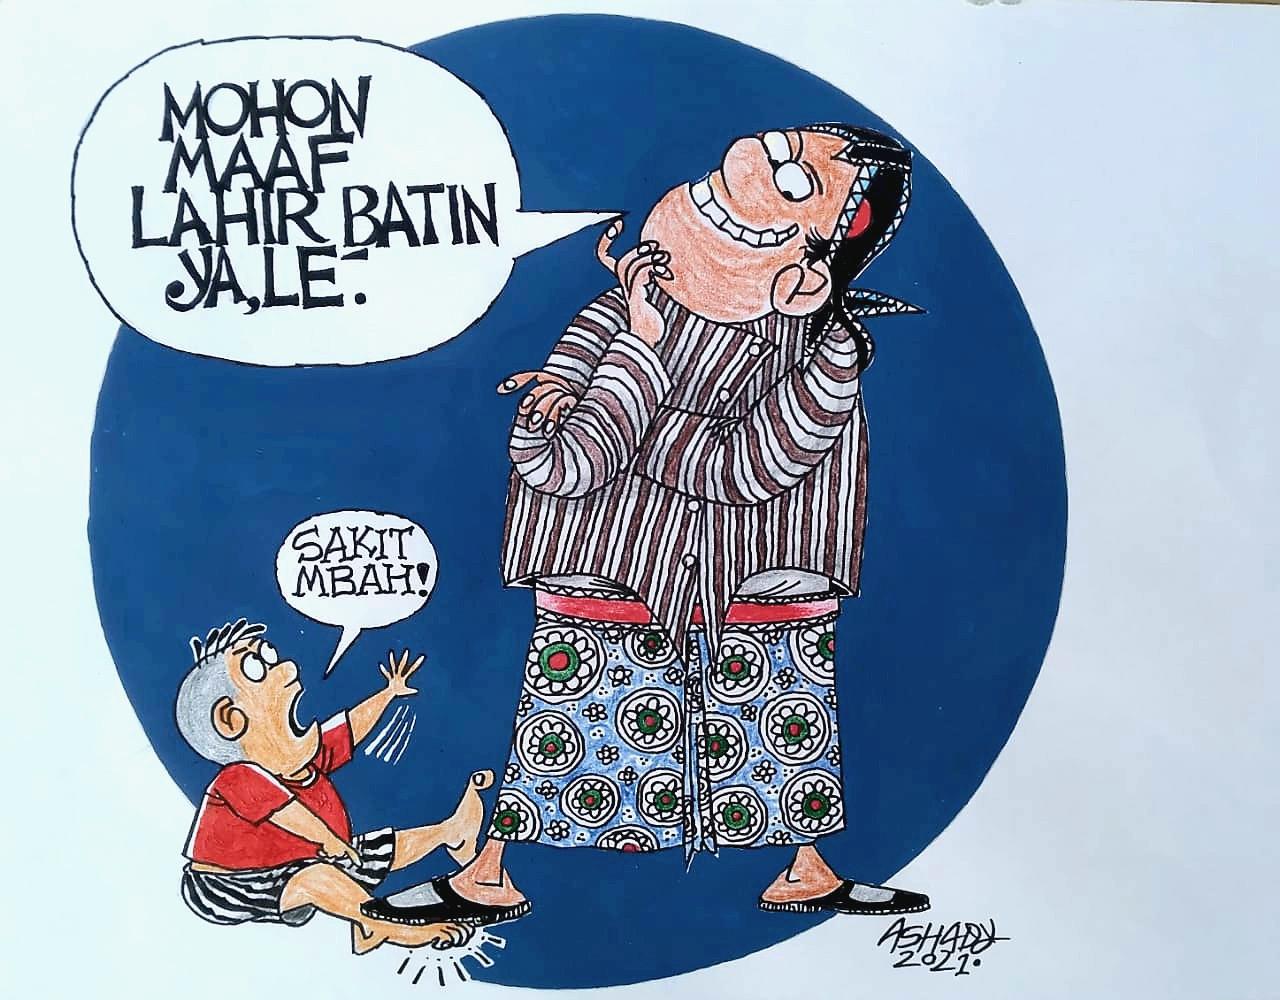 Mohon Maaf Lahir Batin. Karikatur oleh Ashady - JPNN.com